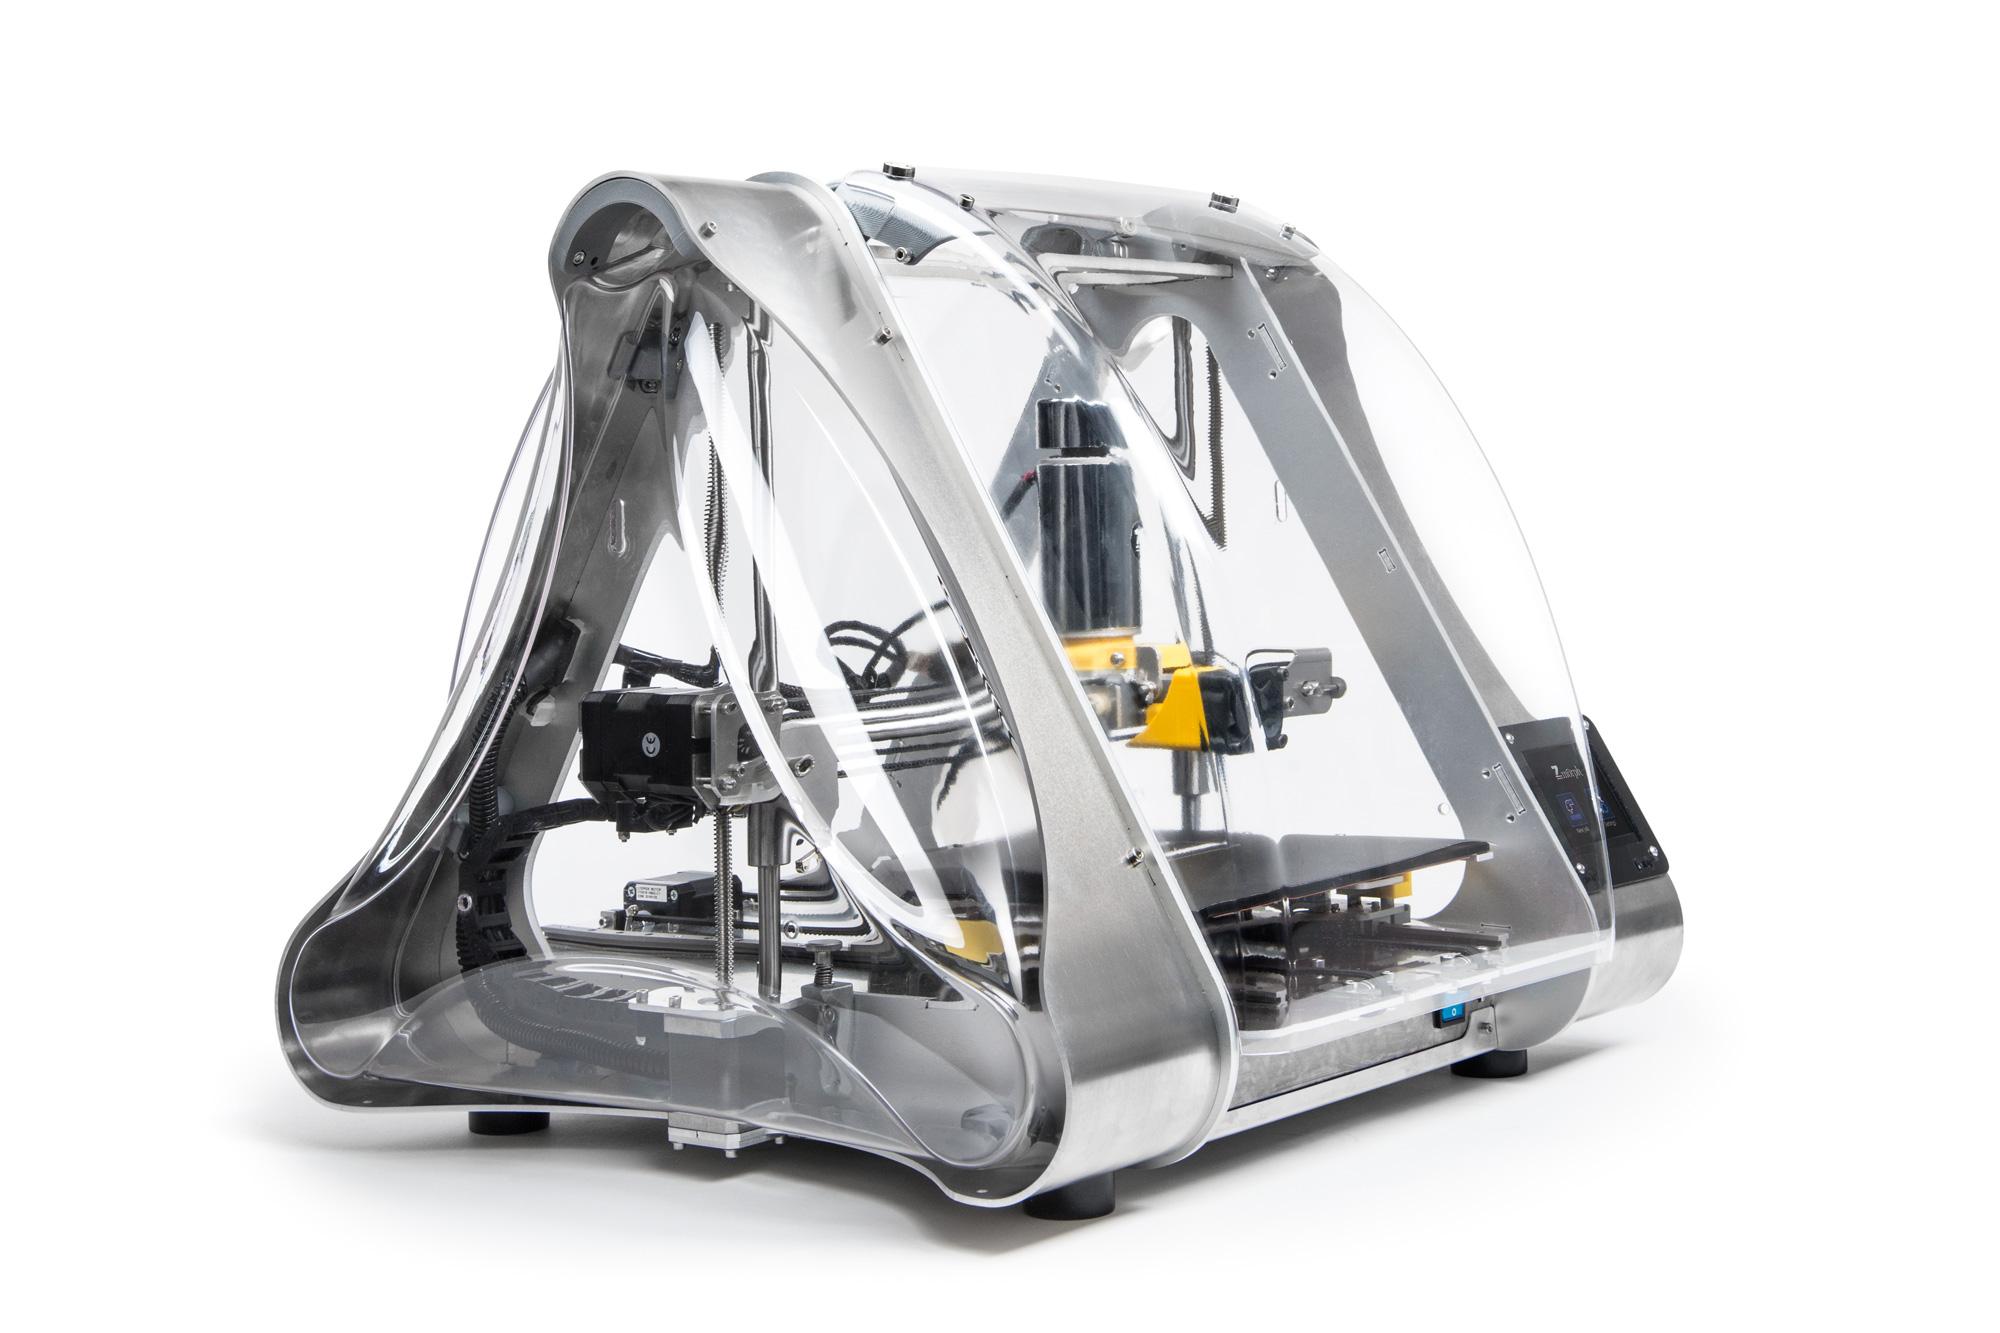 ZMorph20SX купить 3Д принтер Украине